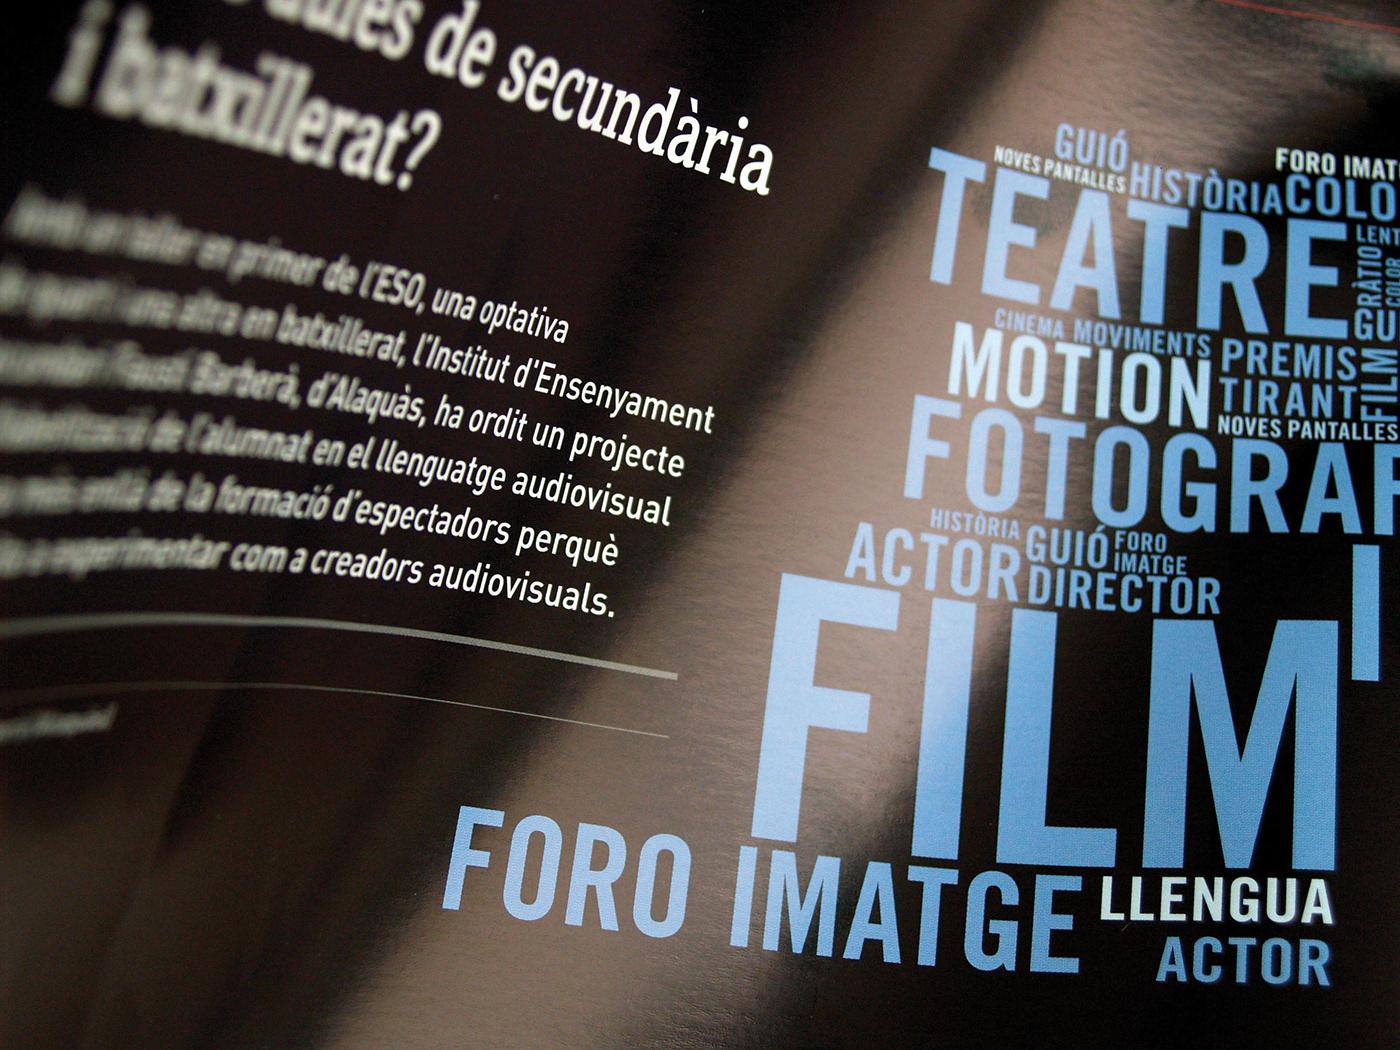 design graphic magazine cultural teaching University universität degrees Master editorial